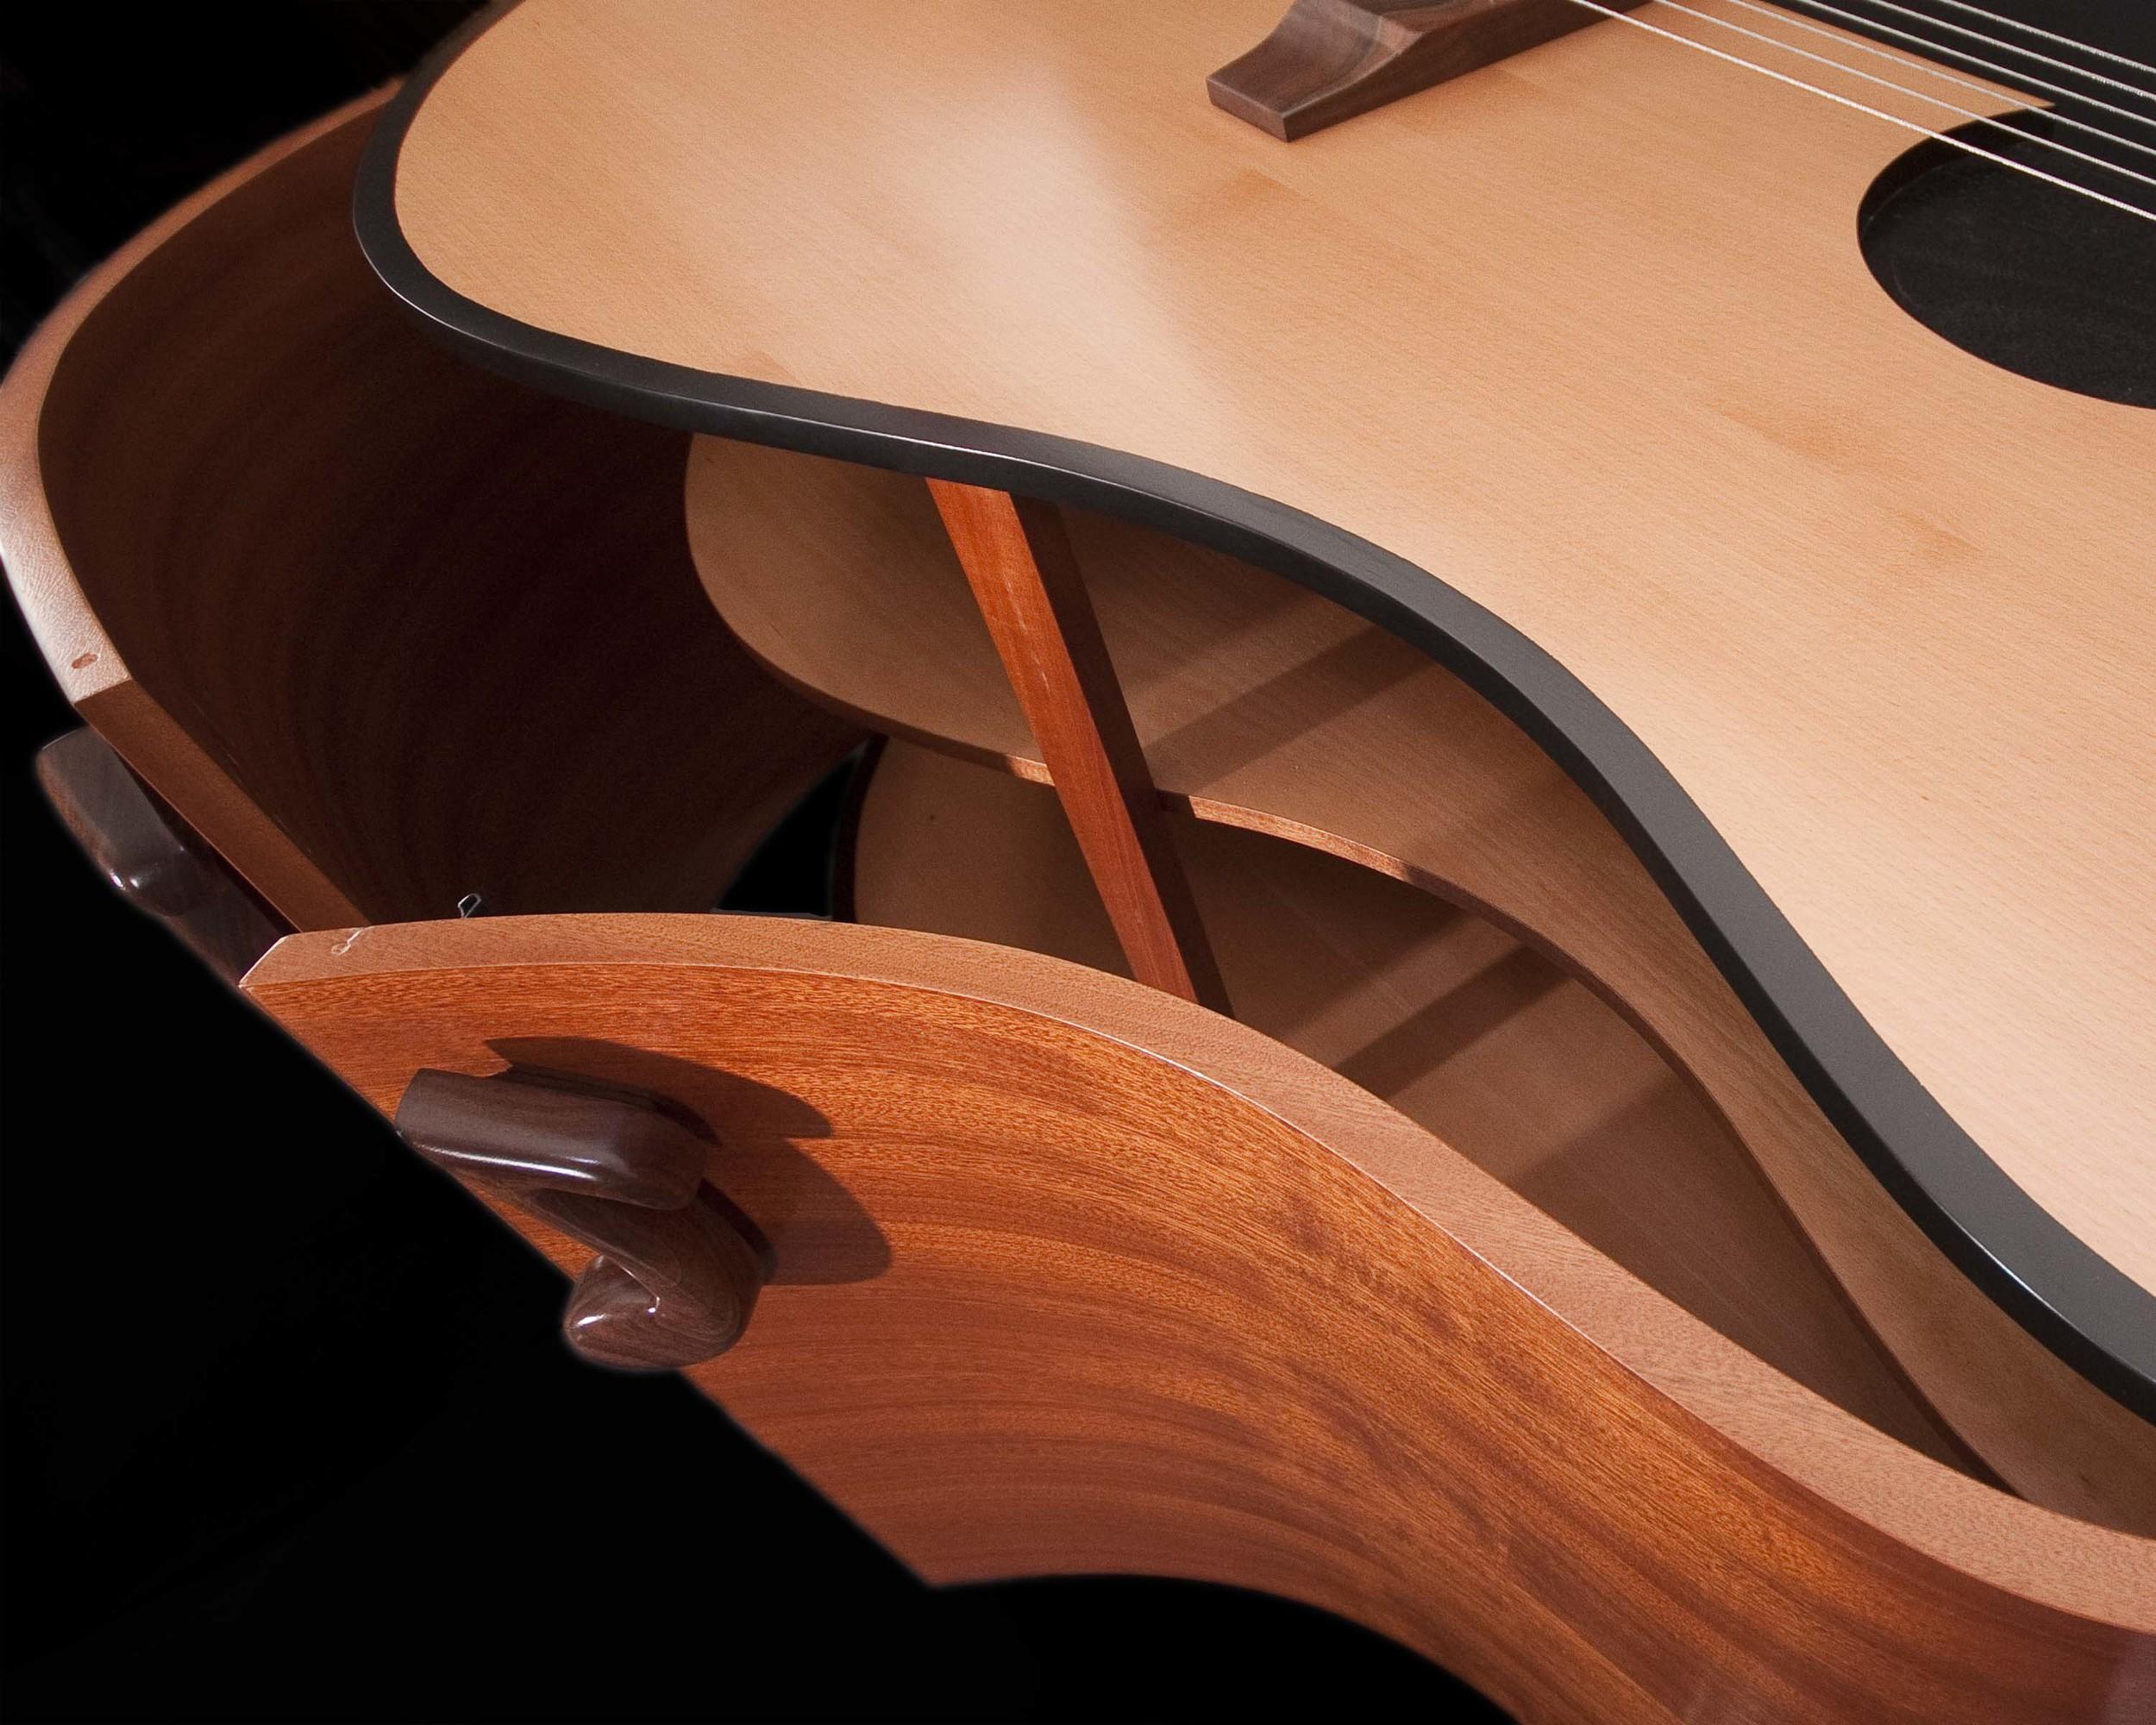 Guitar6.jpg